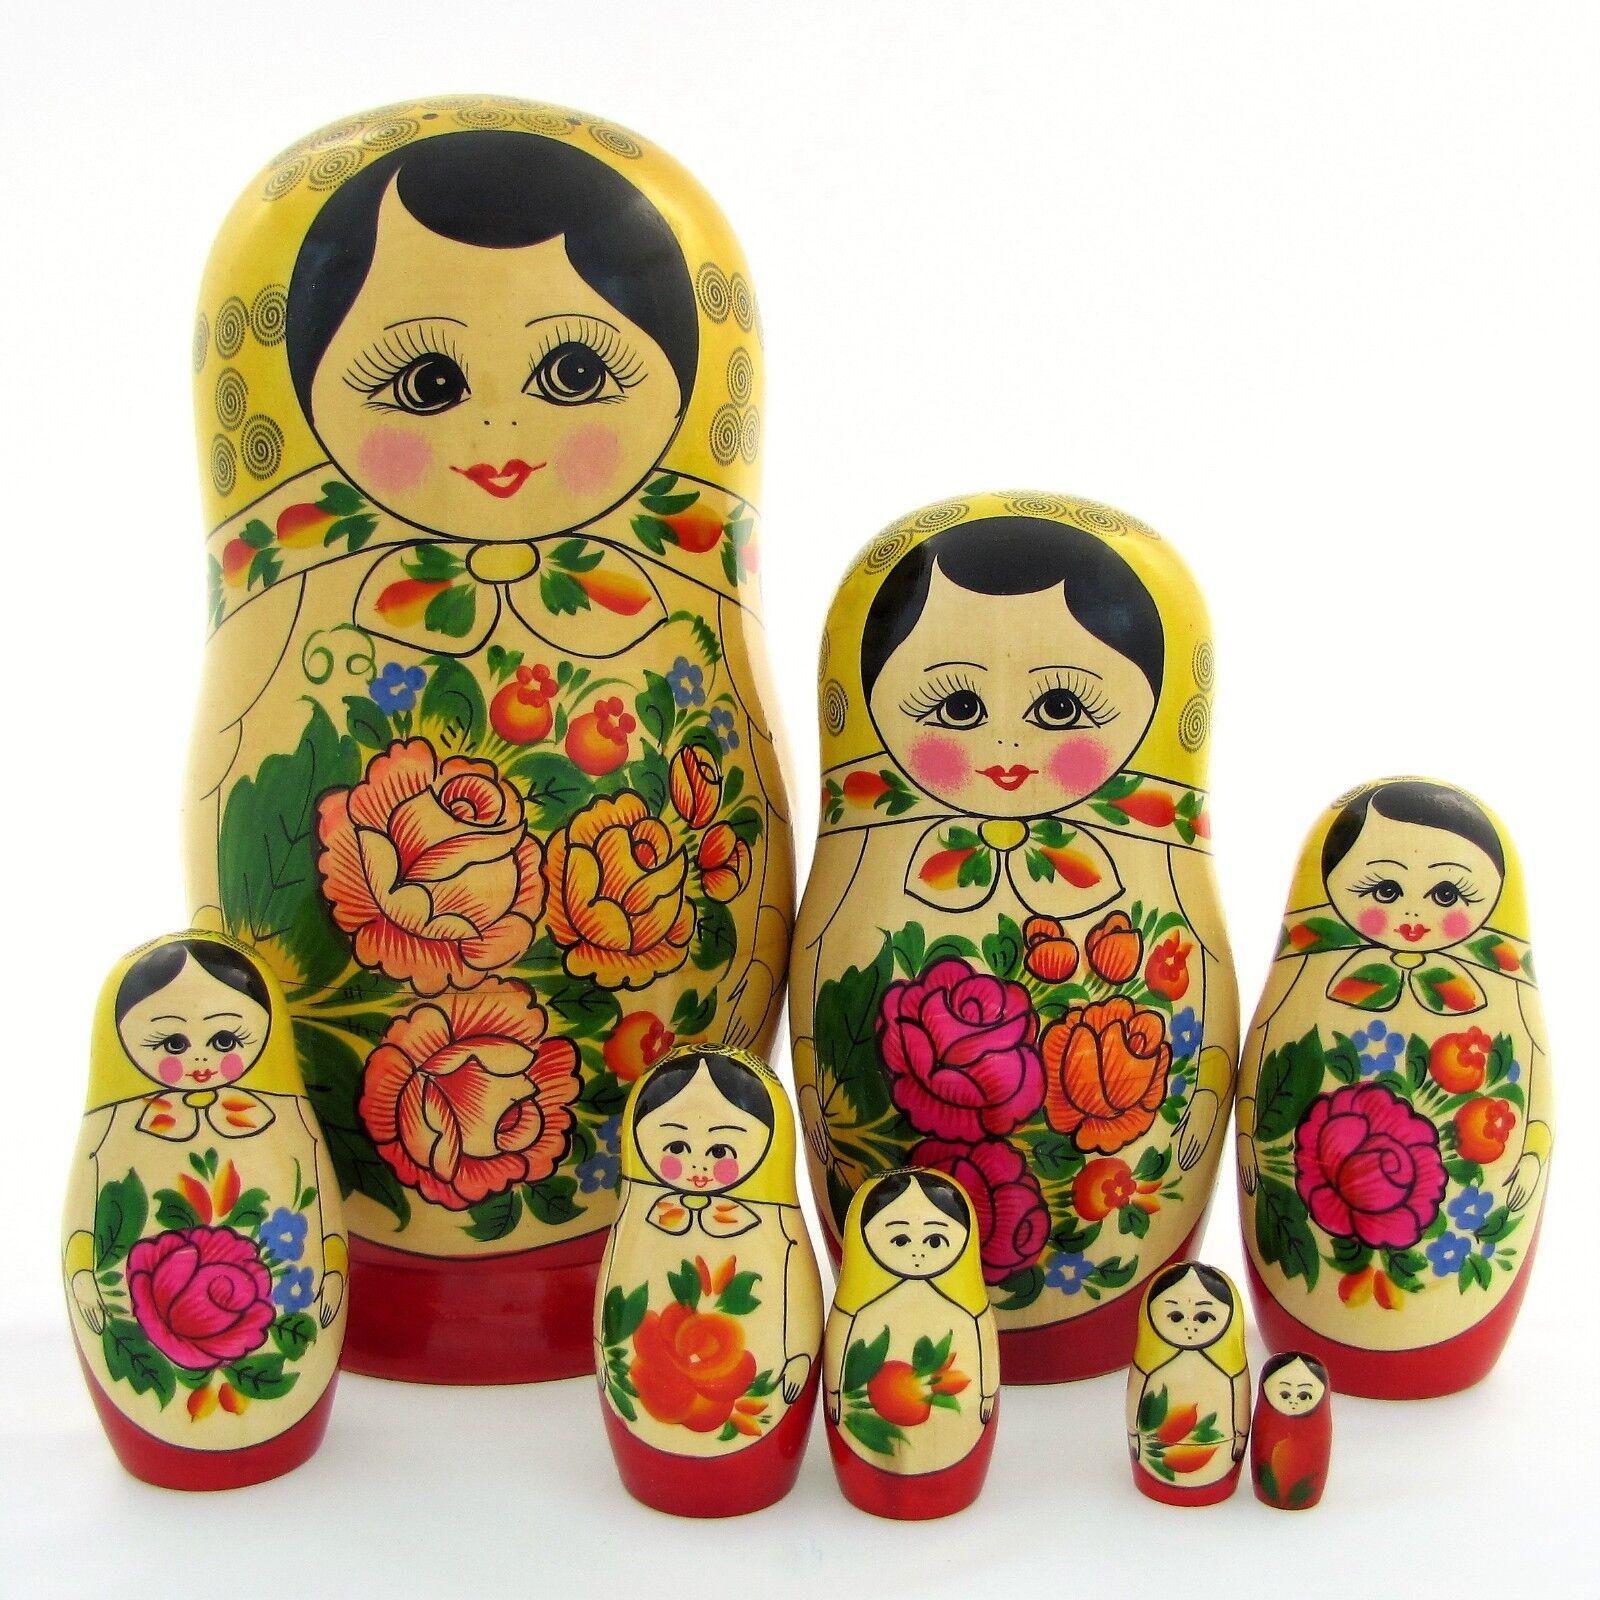 8 Poupées russes H27 Matriochka peint main signé Russian Nested Doll Gigognes